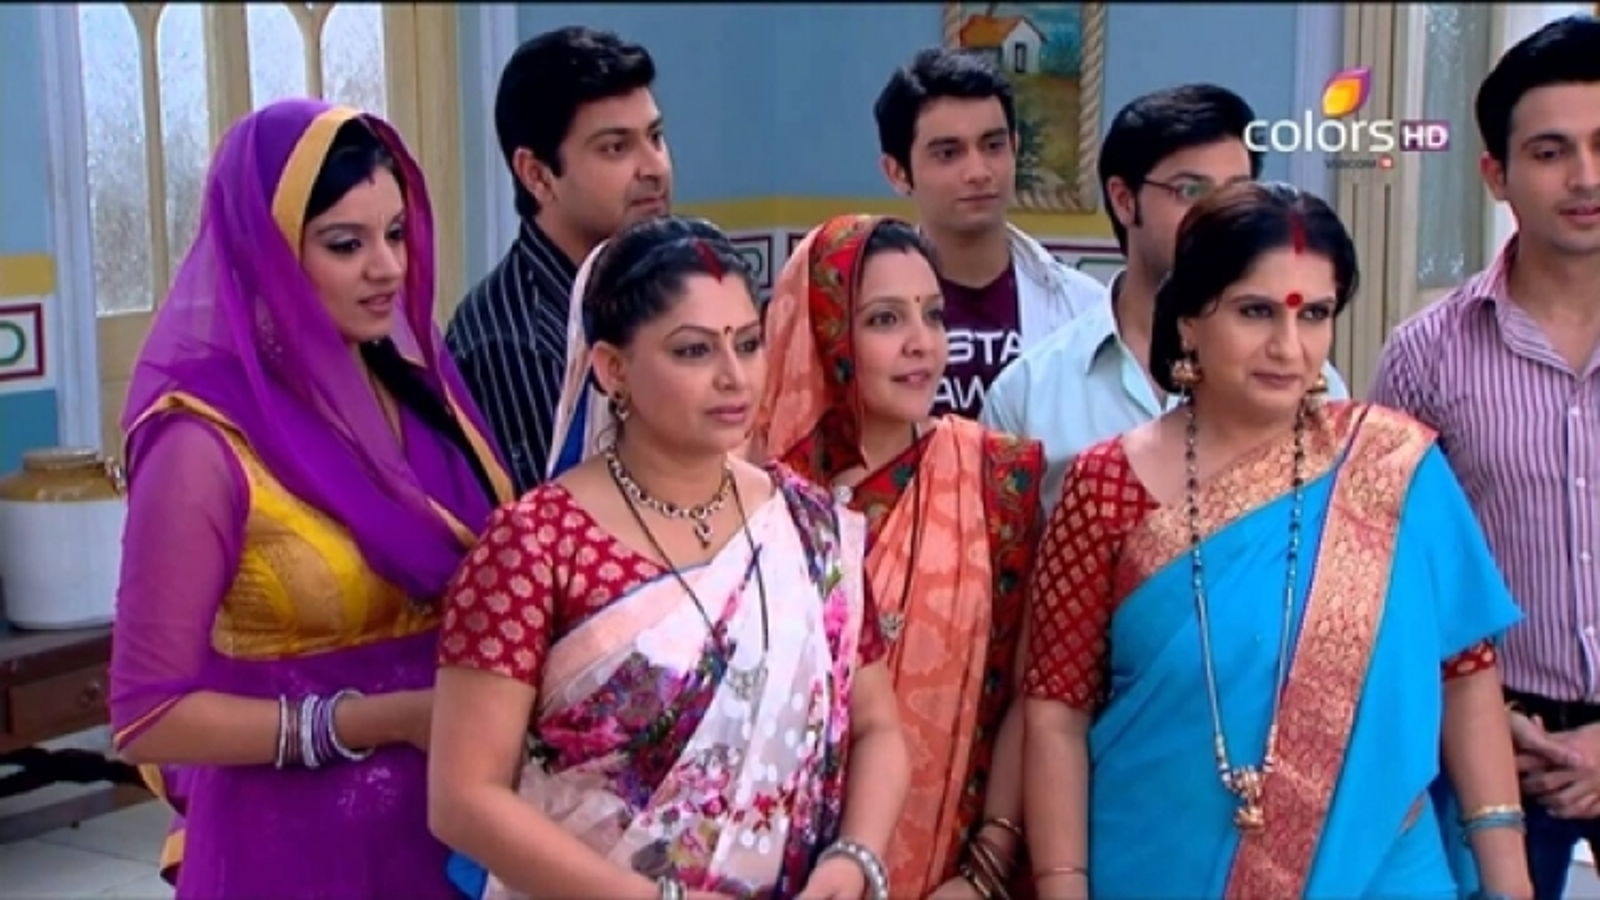 Indian soap operas popular on Vietnamese TV